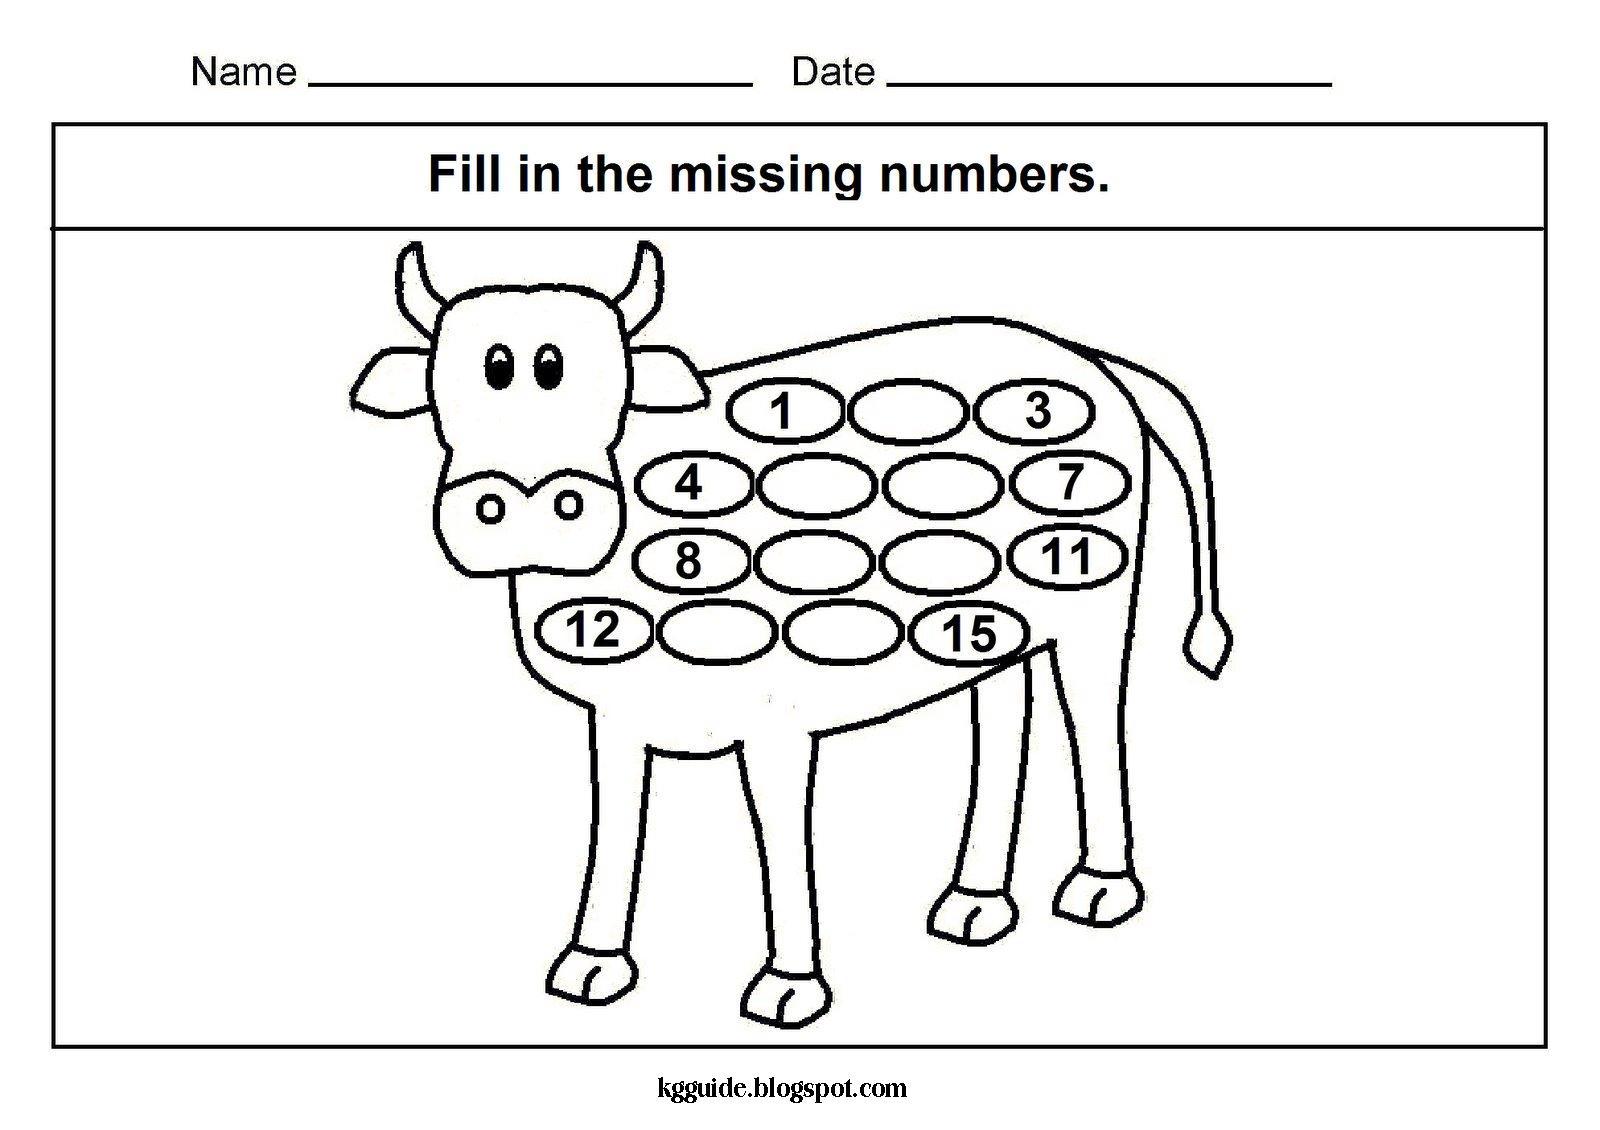 math worksheet : maths worksheet for kindergarten missing numbers  kindergarten  : Missing Number Worksheets For Kindergarten